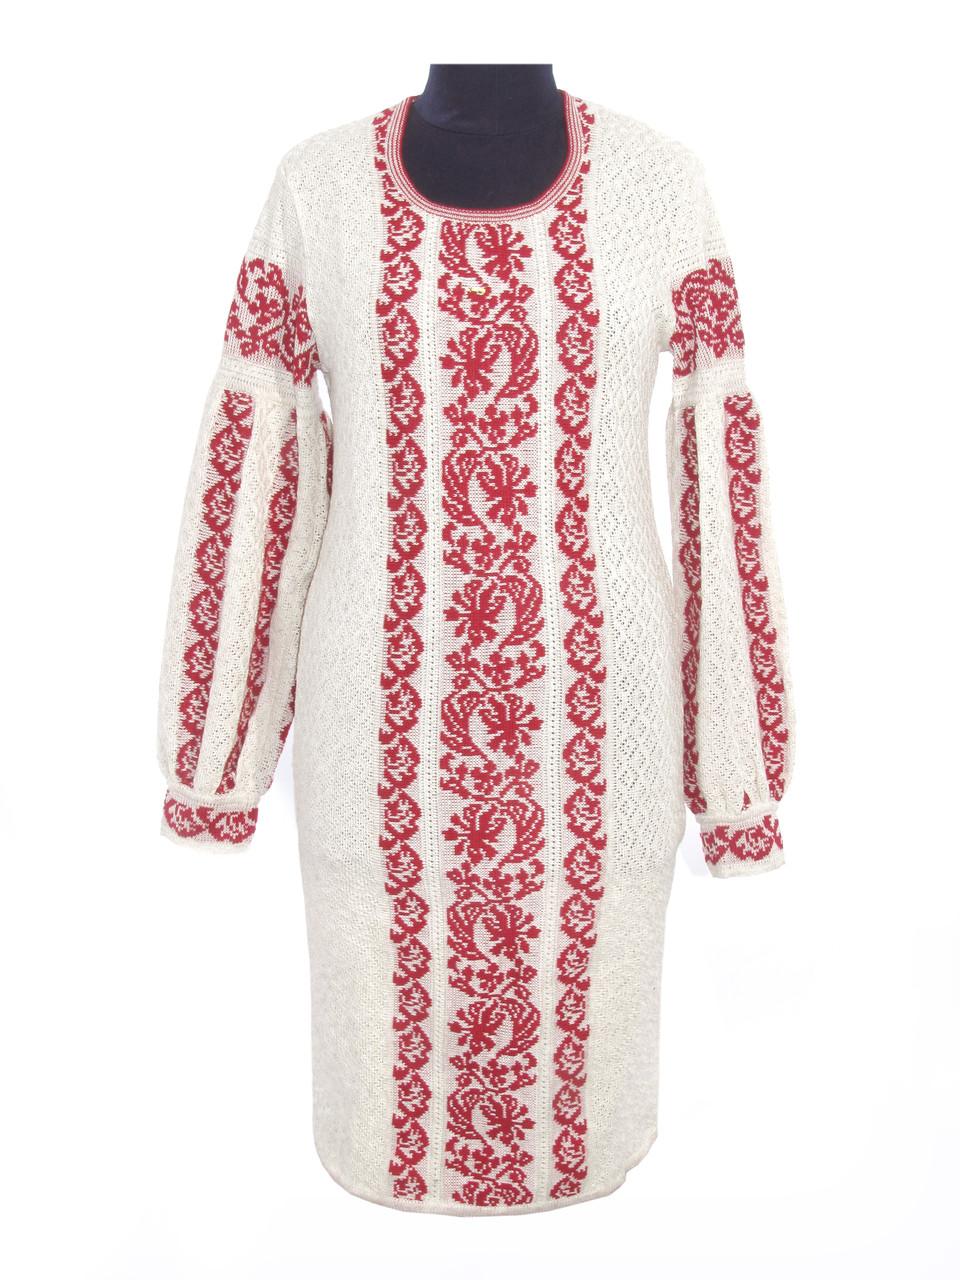 Плаття жіноче в язане Львів янка червона  продажа 15acf52e56de9